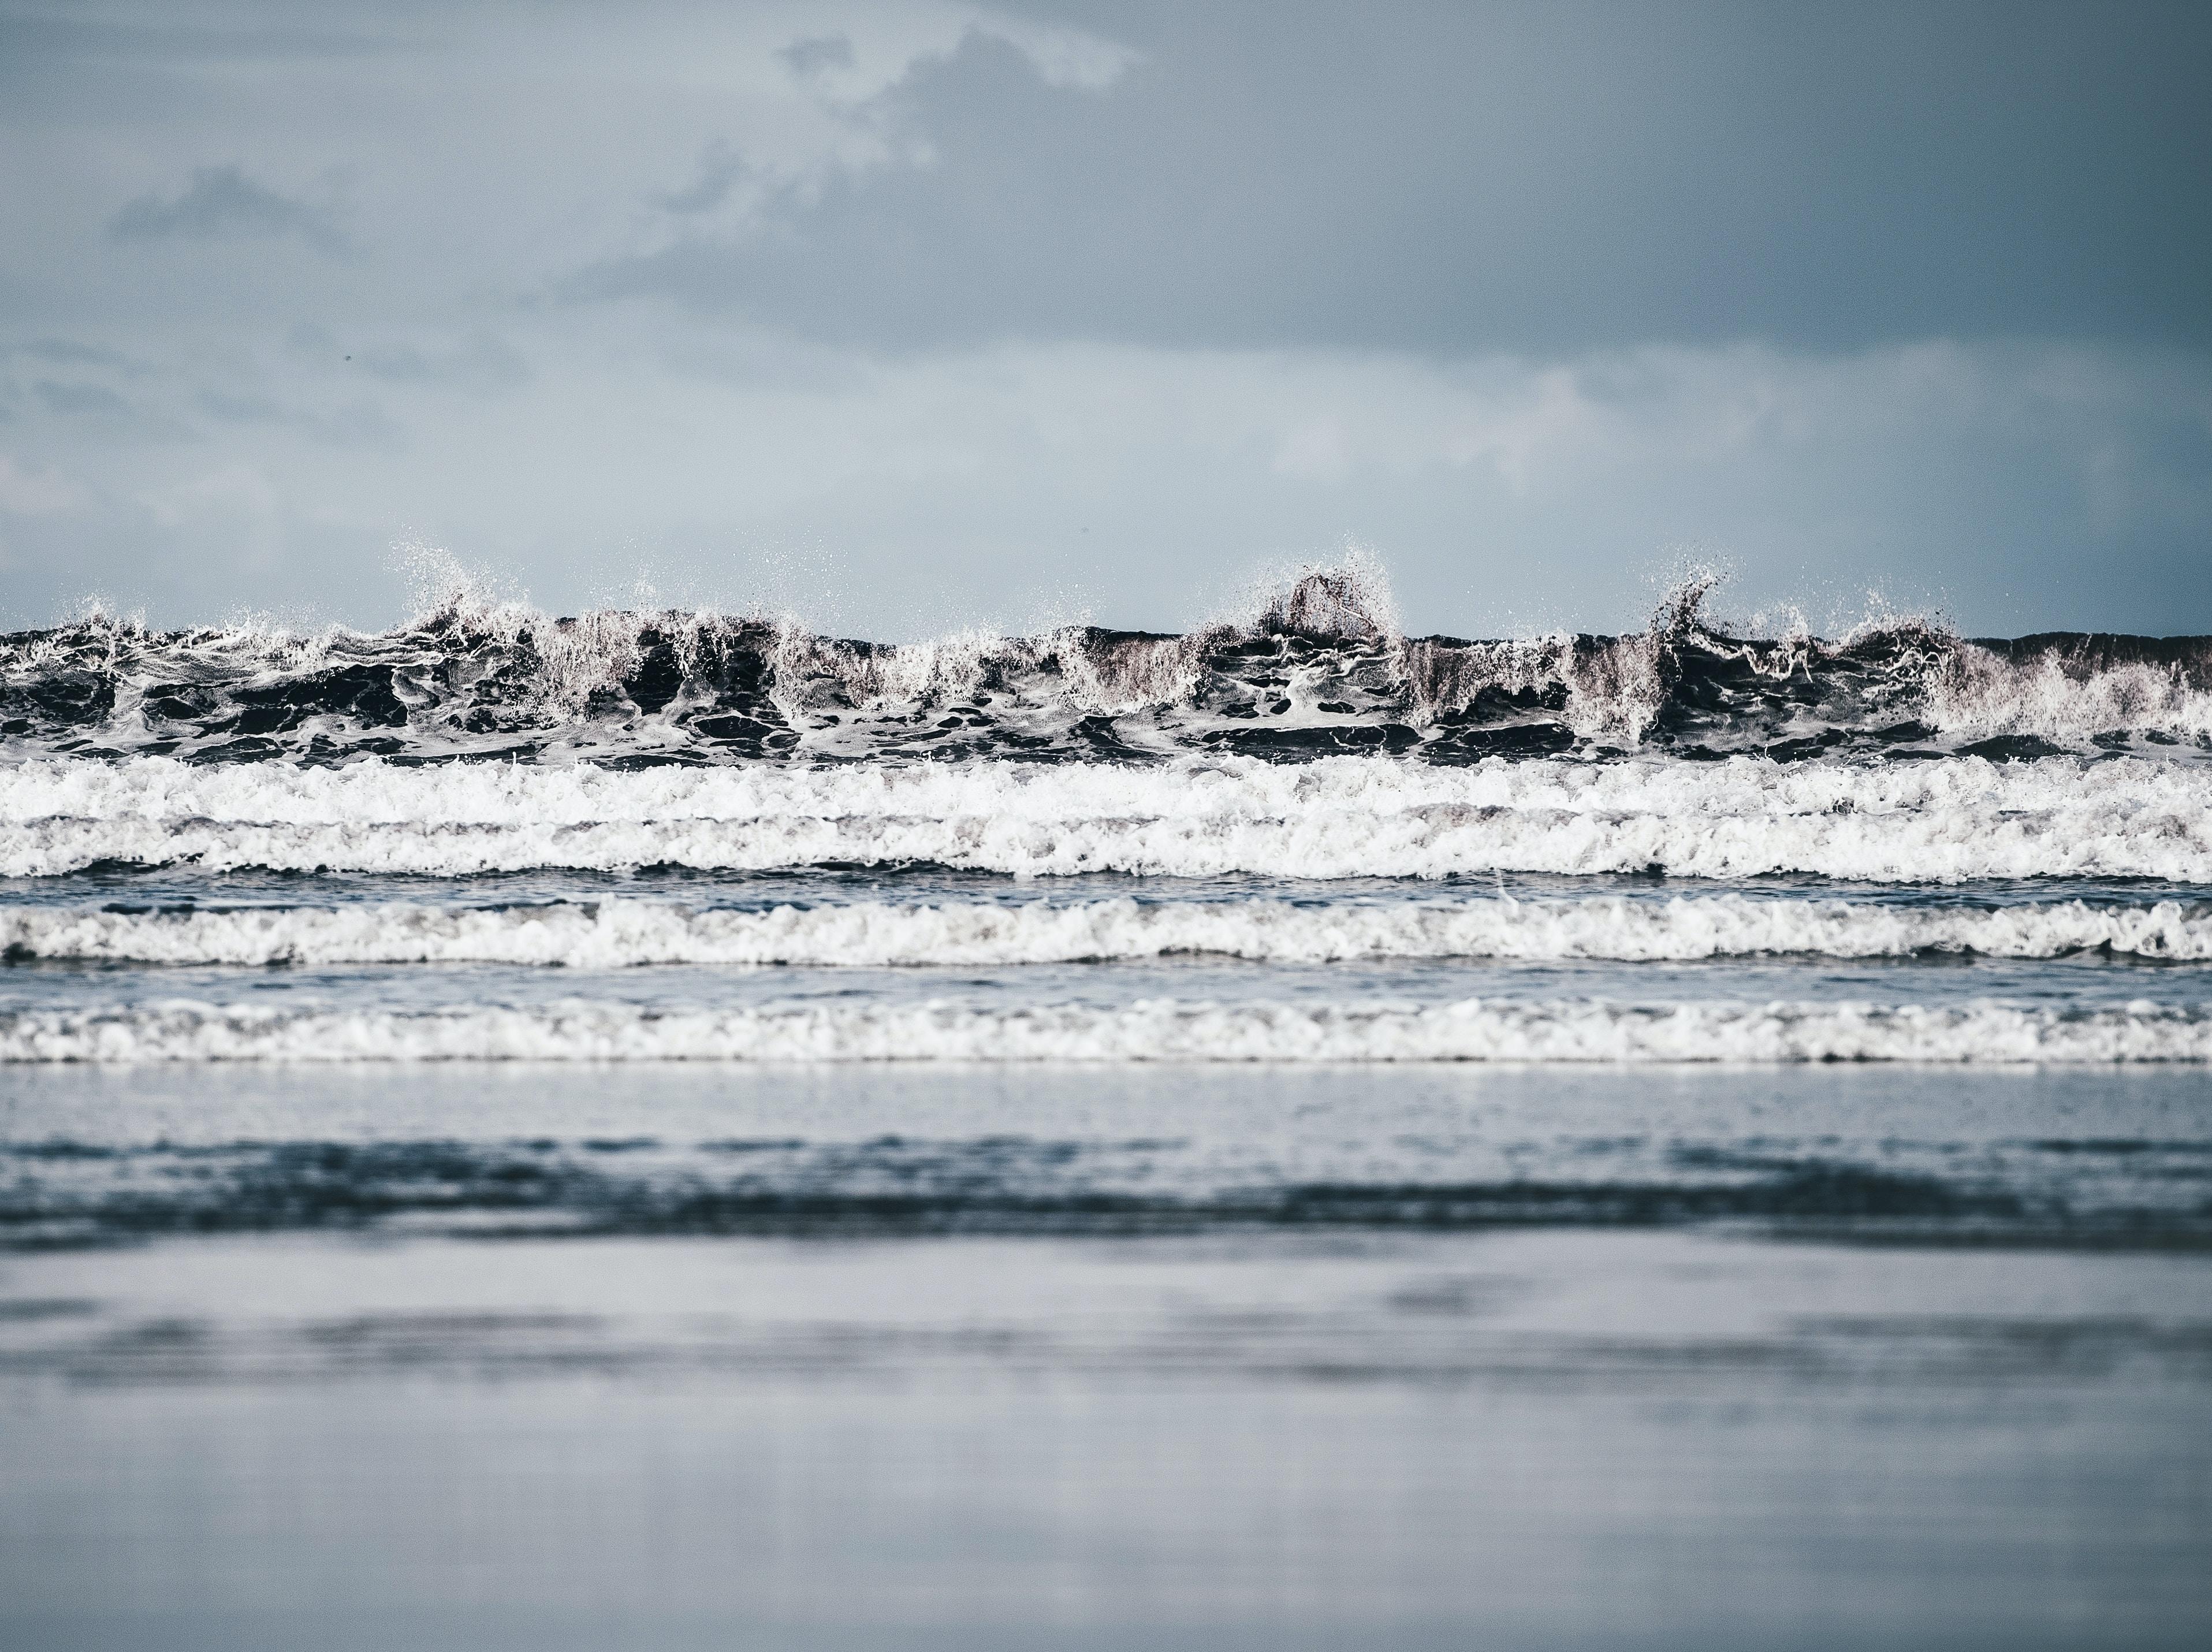 waves splashing on seashore